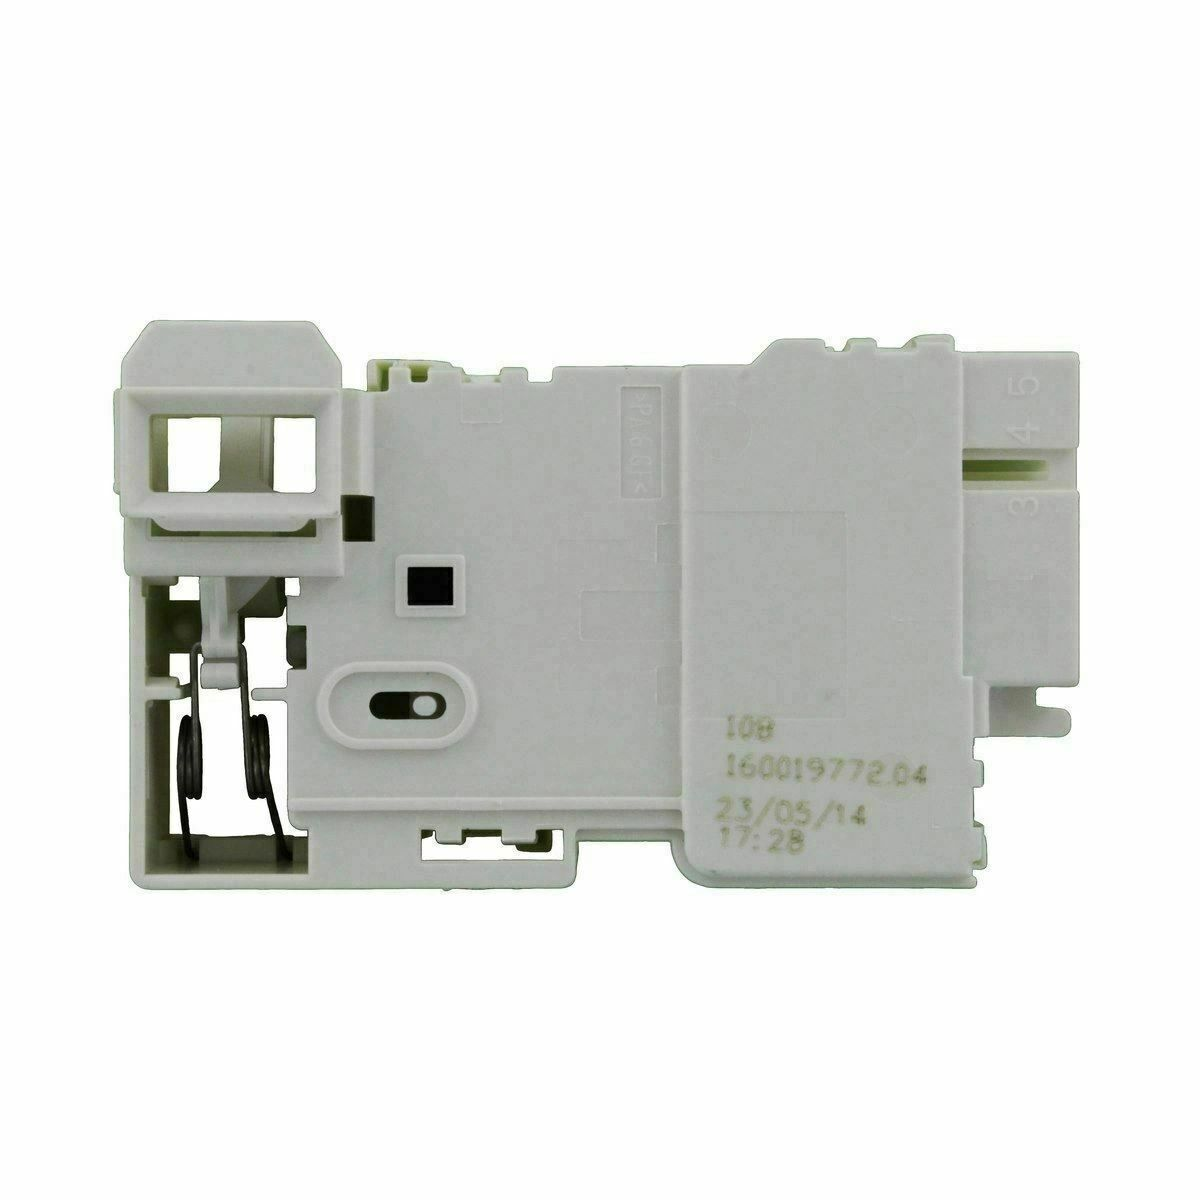 DOOR INTERLOCK INDESIT IDV75 IS60V VTD20T IDV65UK TUMBLE DRYER LOCK SWITCH CATCH